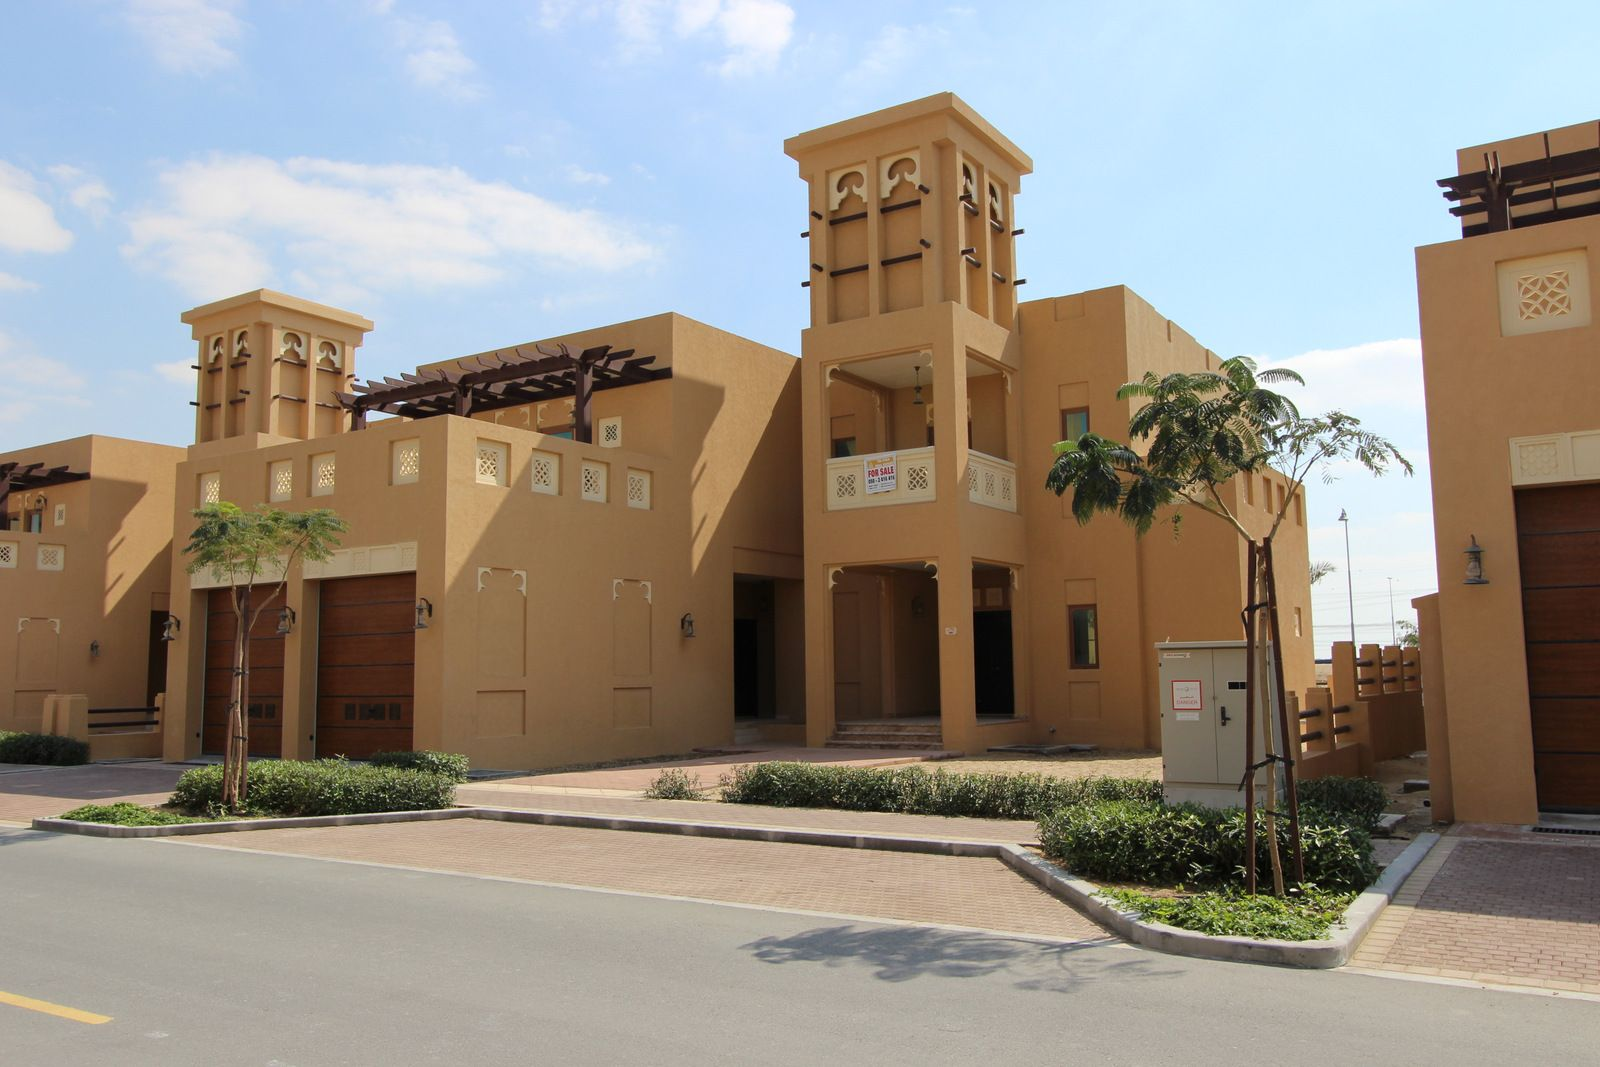 FOR SALE 5,500,000 AED Fabulous 5 bed plus maids Dubai